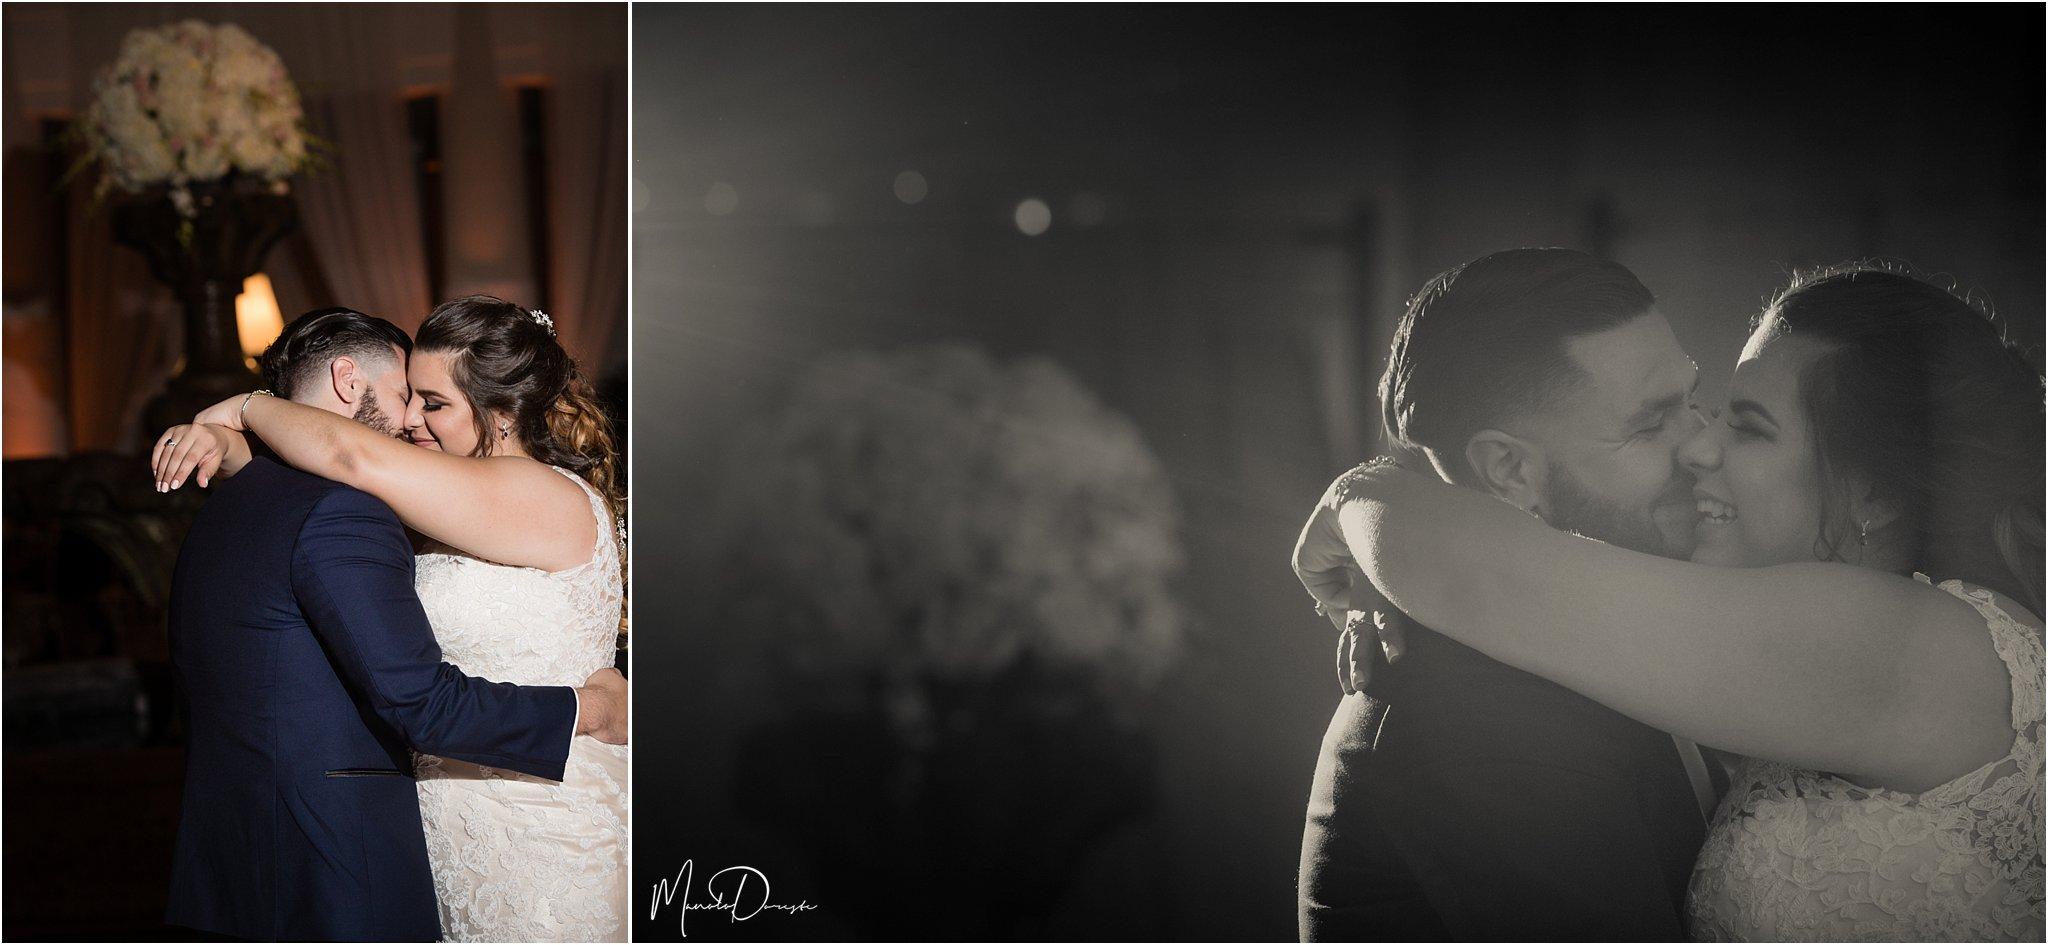 0374_ManoloDoreste_InFocusStudios_Wedding_Family_Photography_Miami_MiamiPhotographer.jpg